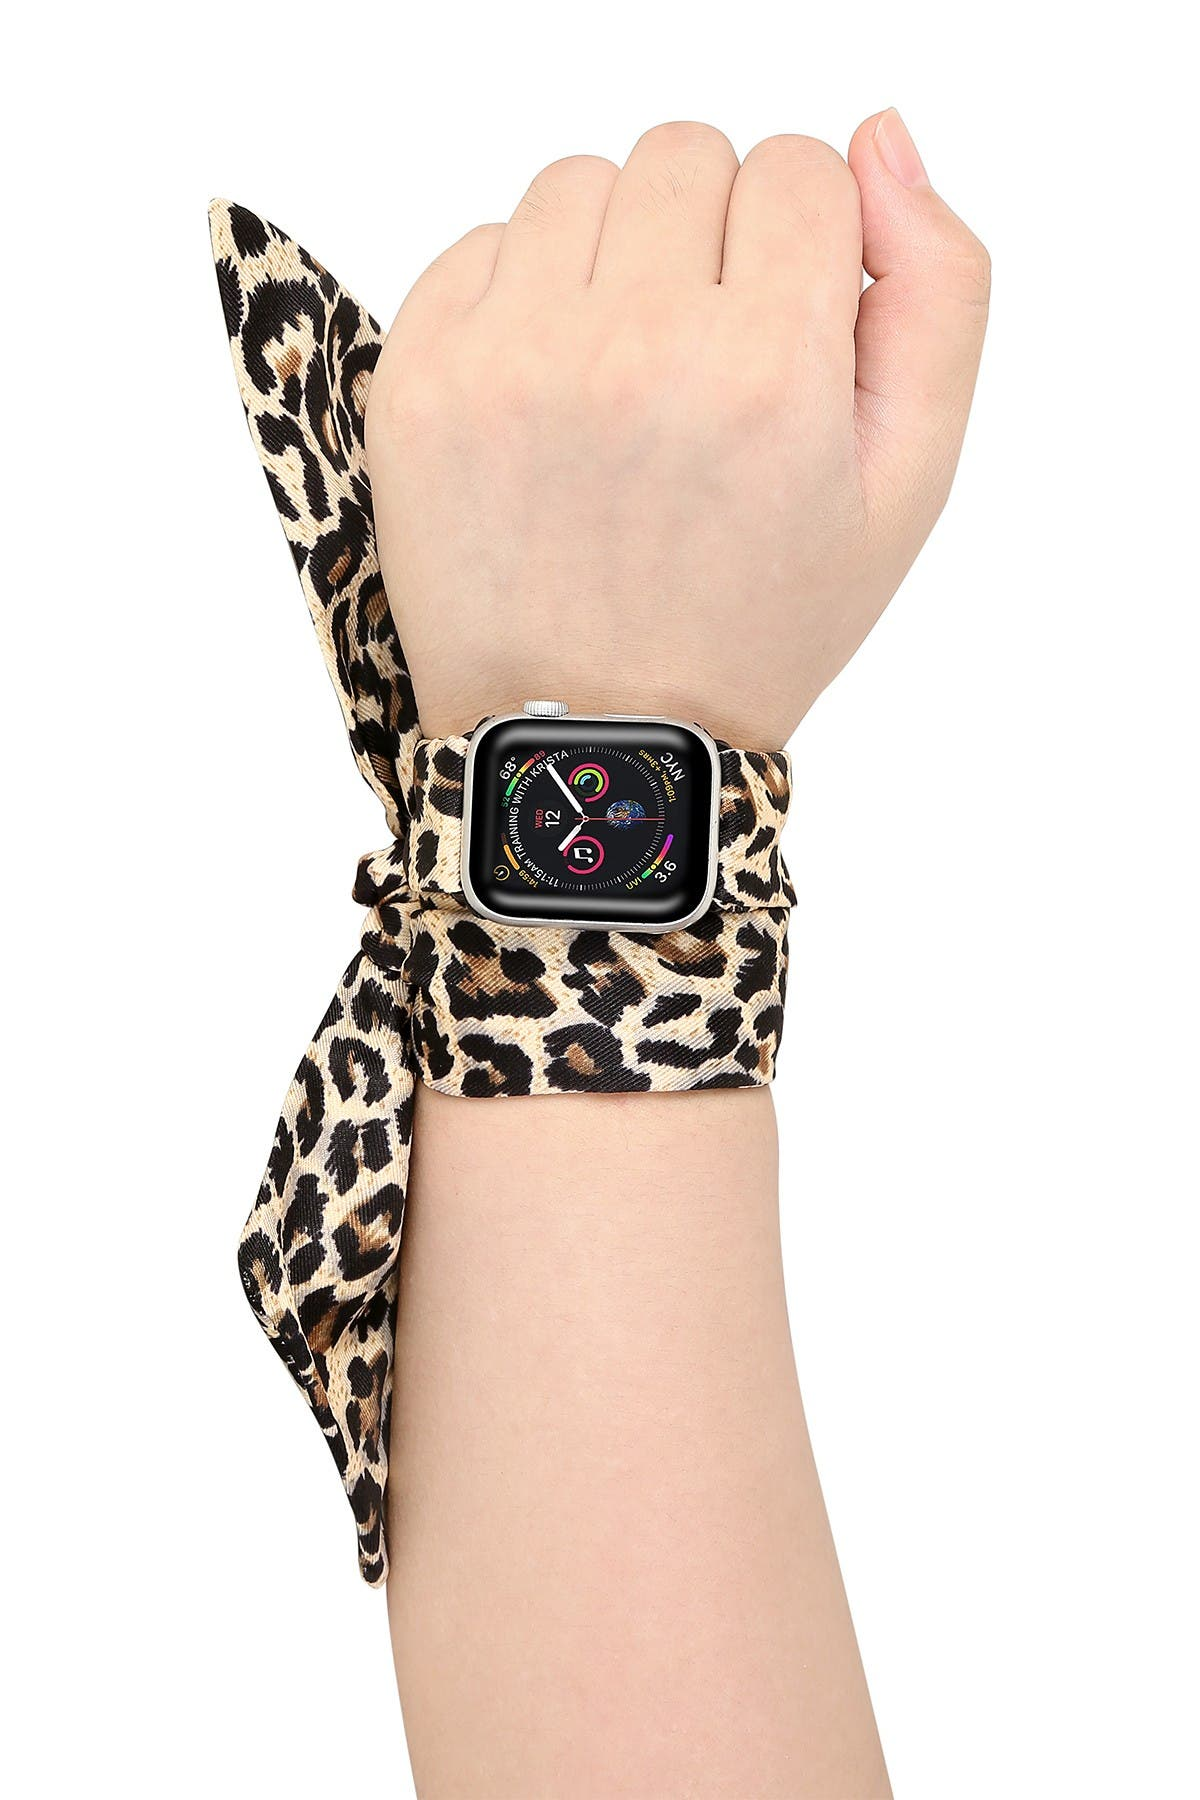 Image of POSH TECH Leopard Silk Scarf 42mm/44mm Apple Watch 1/2/3/4 Band